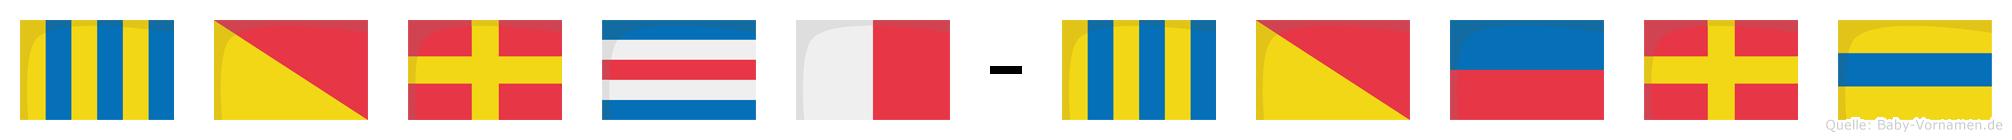 Gorch-Görd im Flaggenalphabet